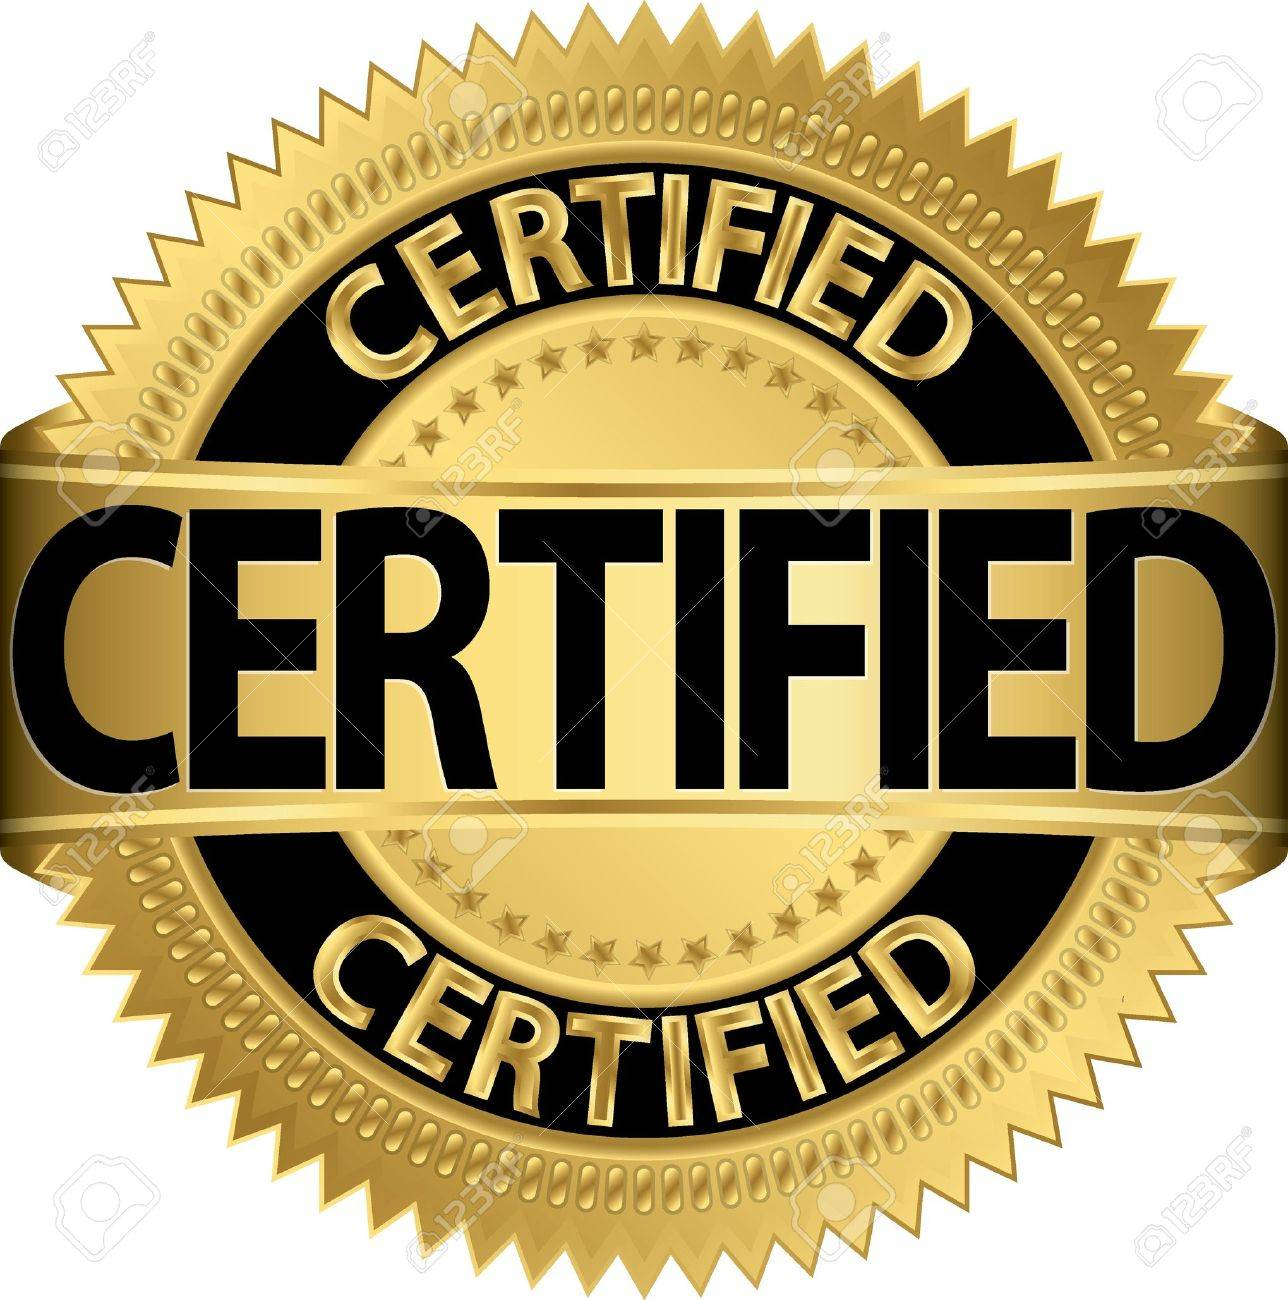 Certified golden label,  illustration Stock Vector - 20352244